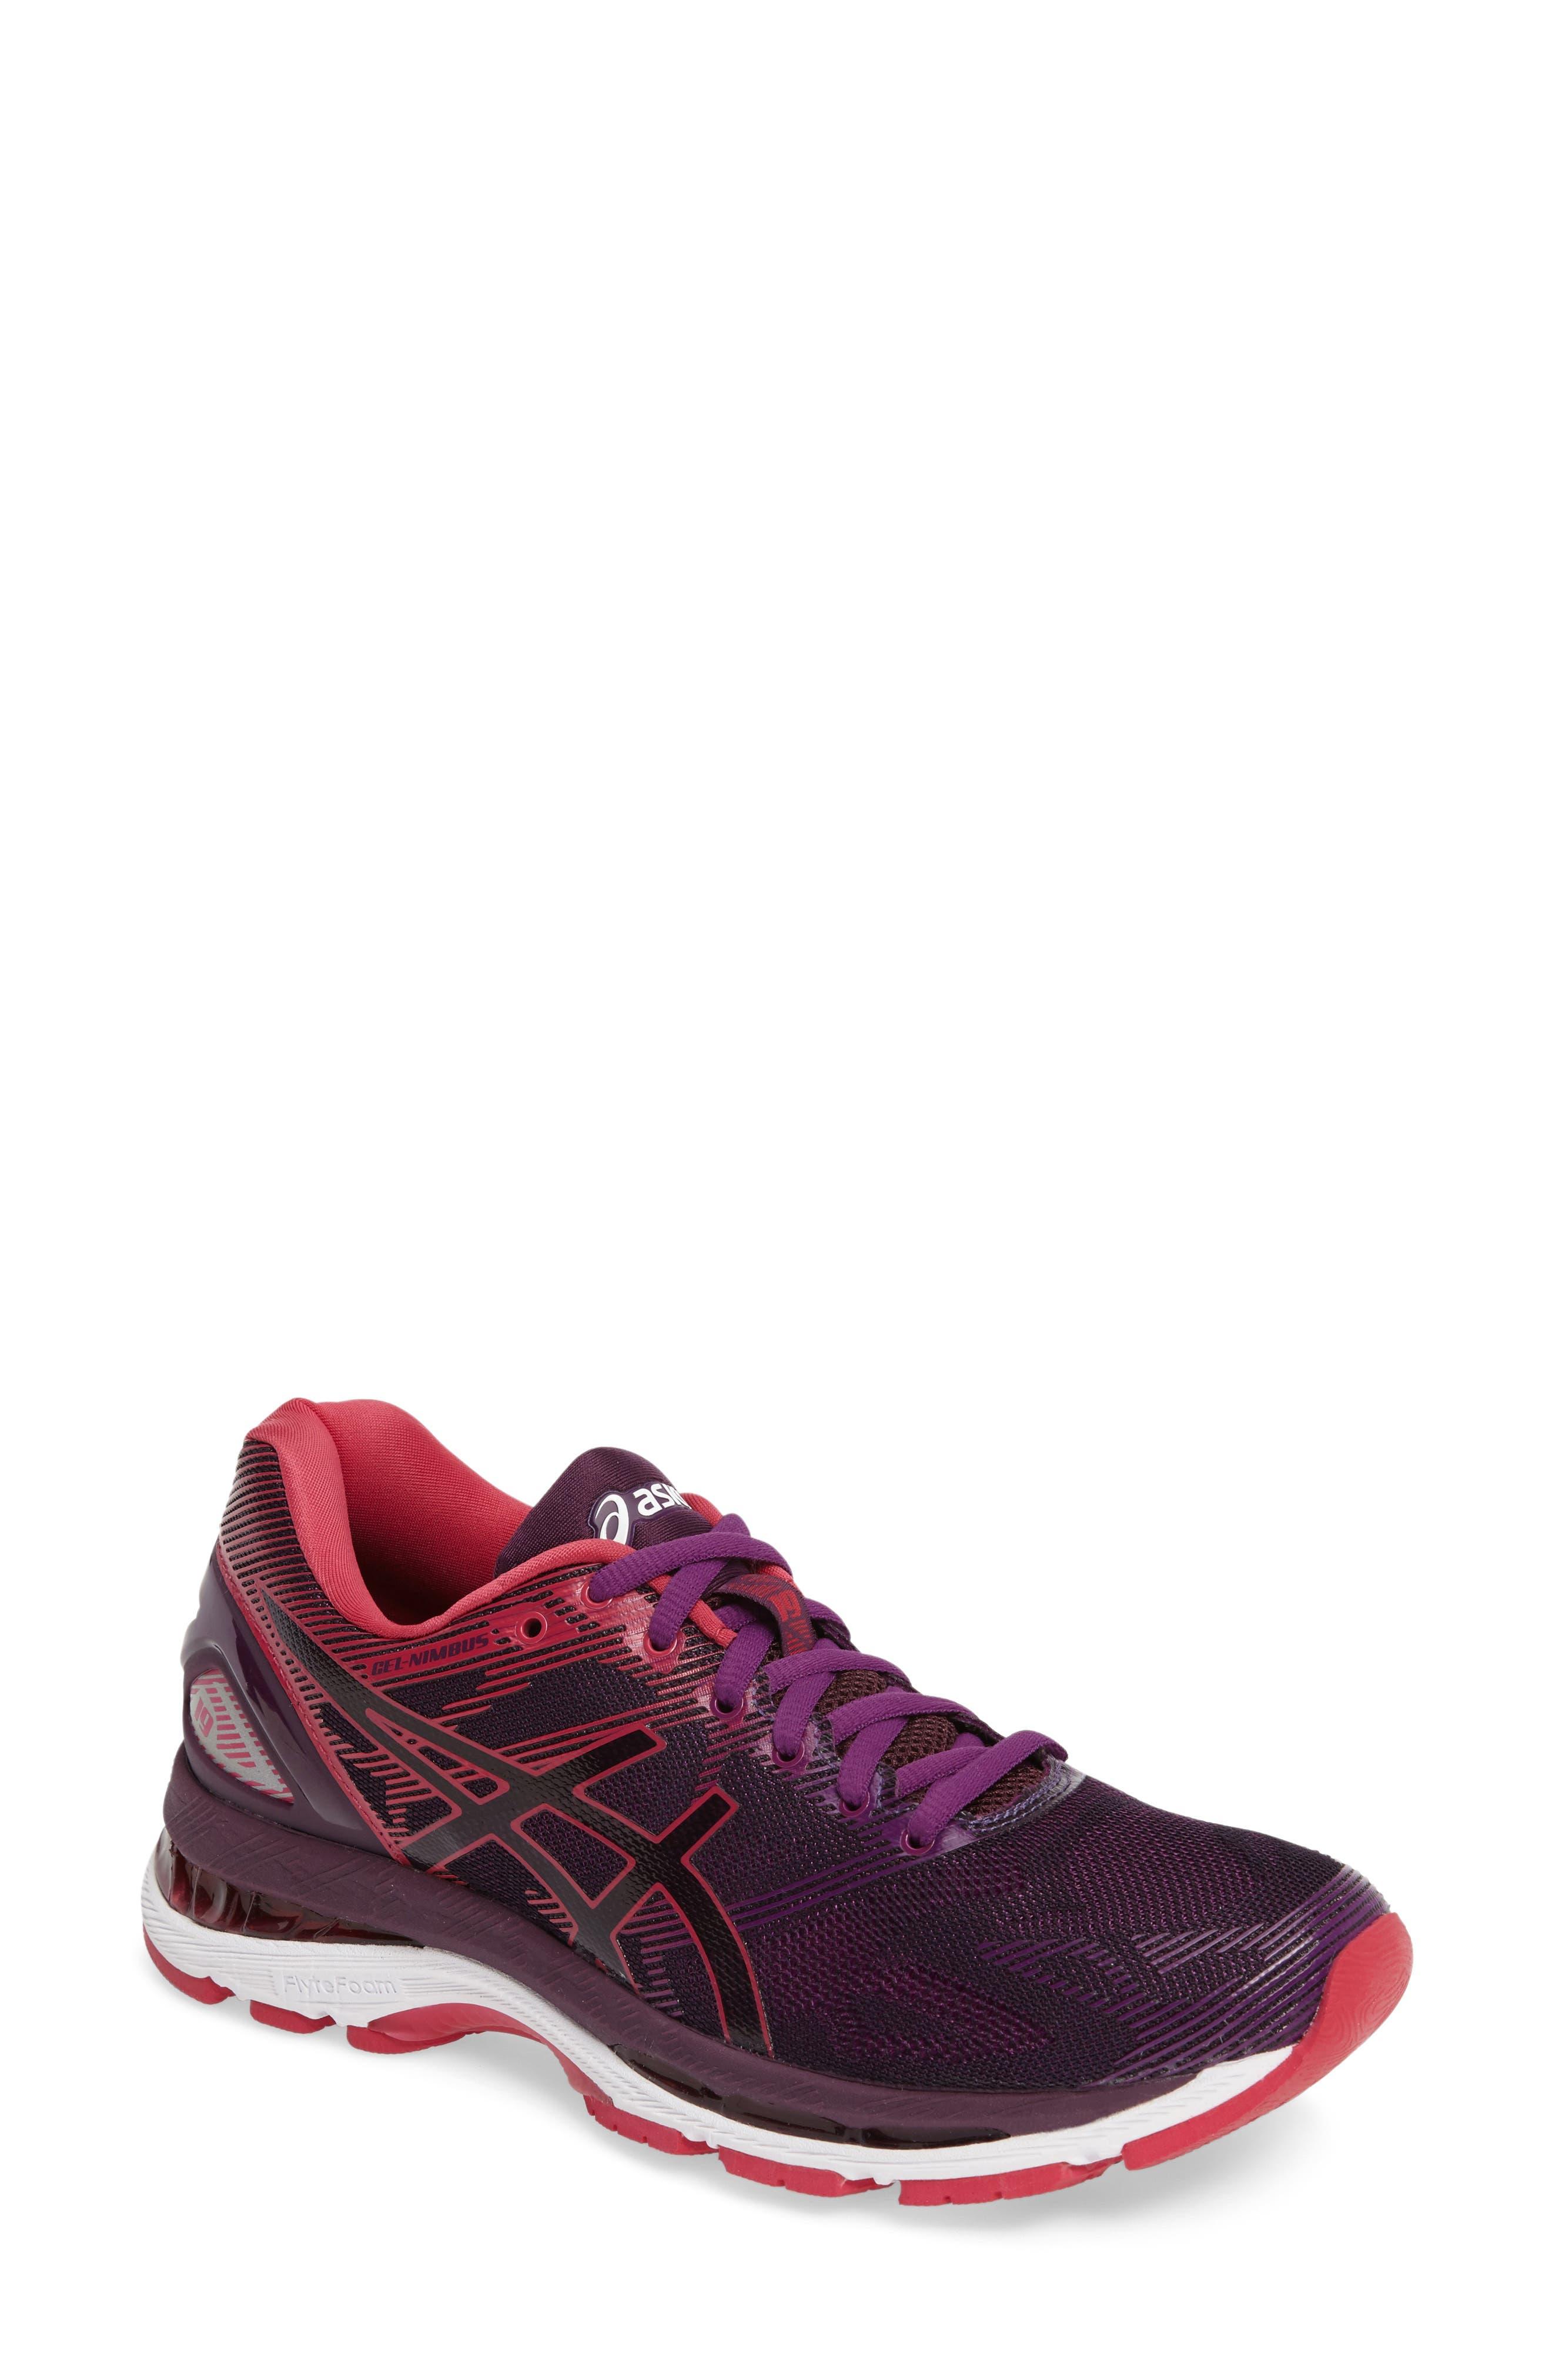 Alternate Image 1 Selected - ASICS® GEL®-Nimbus 19 Running Shoe (Women)